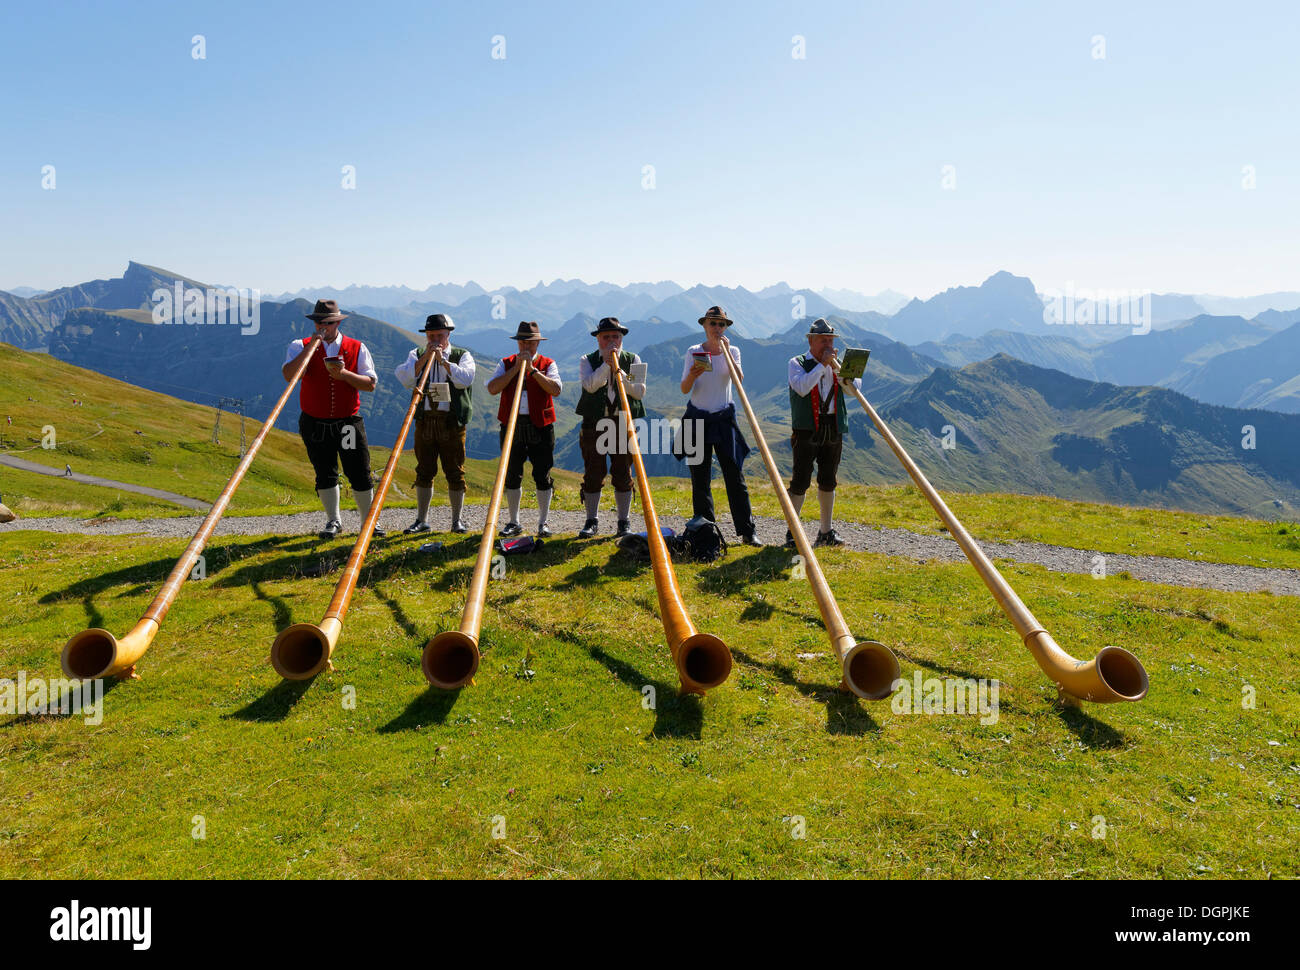 Joueurs de cor des alpes, Diedamskopf, Schoppernau, Bregenzerwald, Forêt Noire, Vorarlberg, Autriche Photo Stock